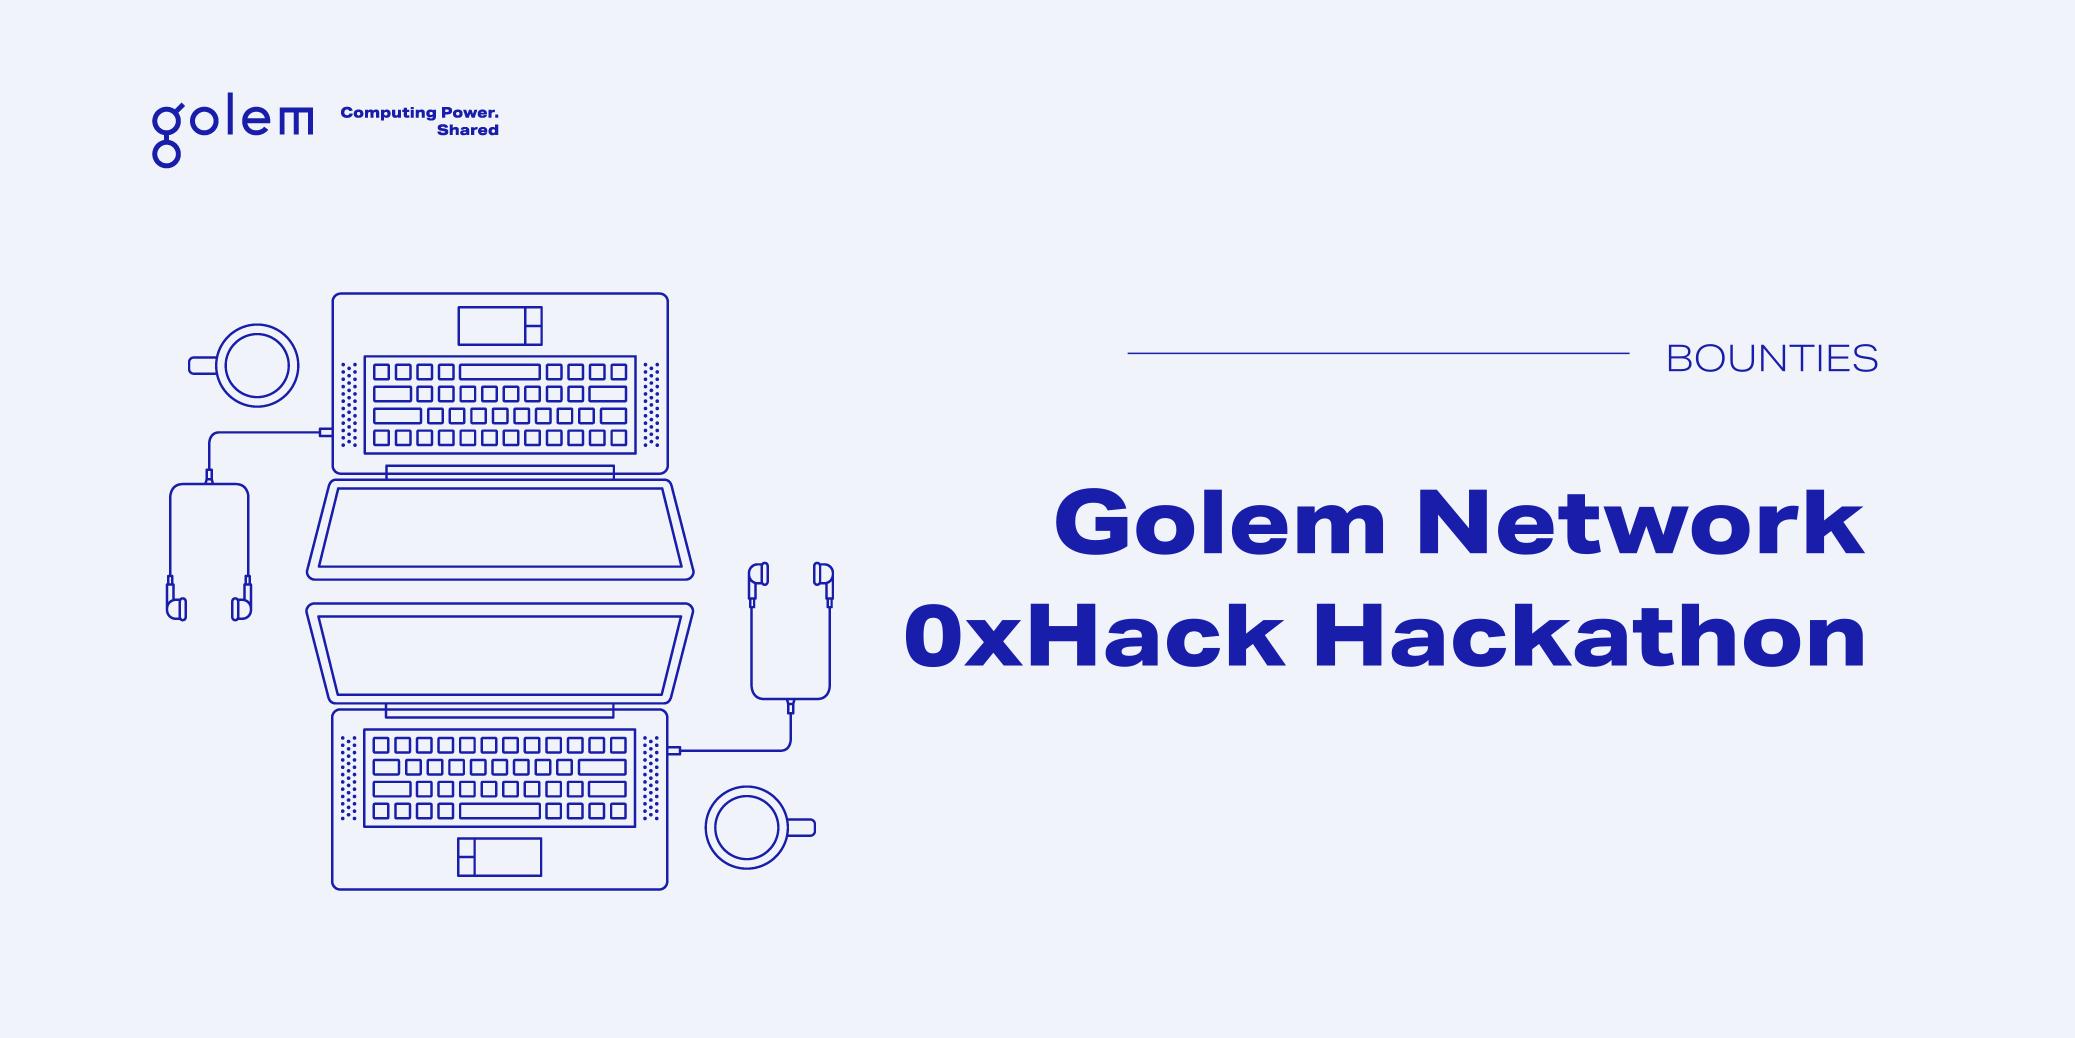 Meet the winners: 0xHack